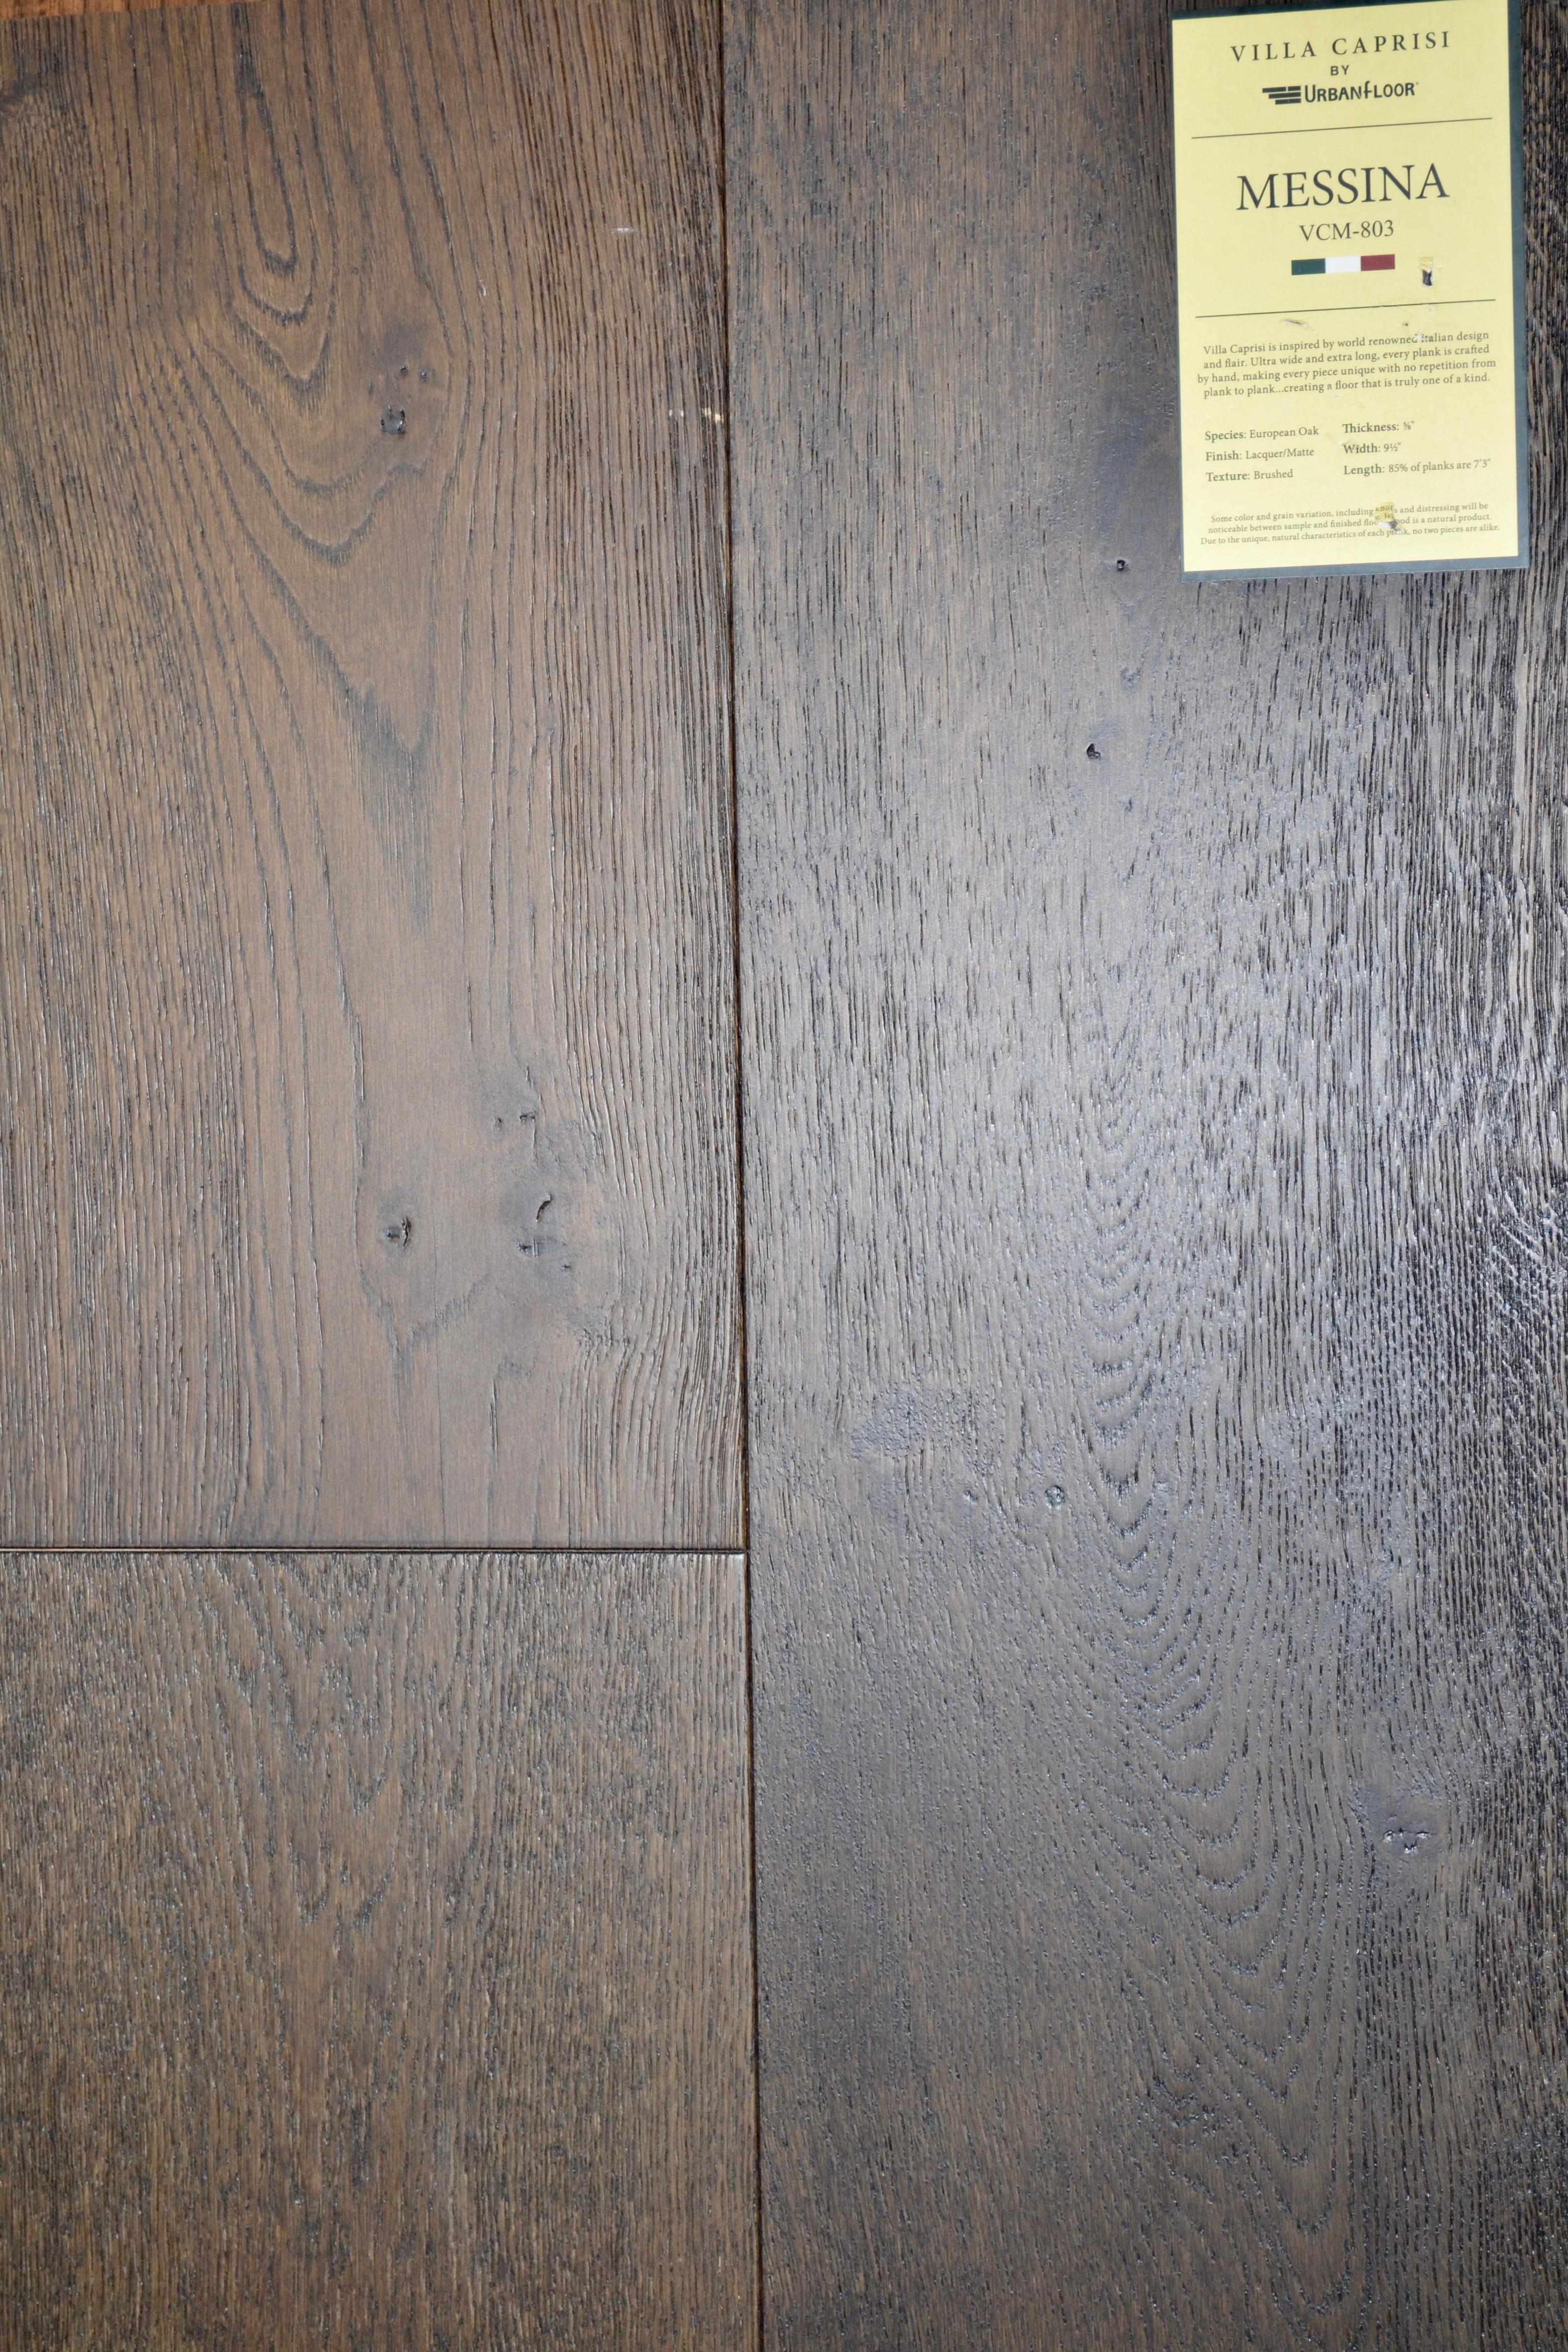 types of hardwood floors species of villa caprisi fine european hardwood millennium hardwood inside european style inspired designer oak floor messina by villa caprisi